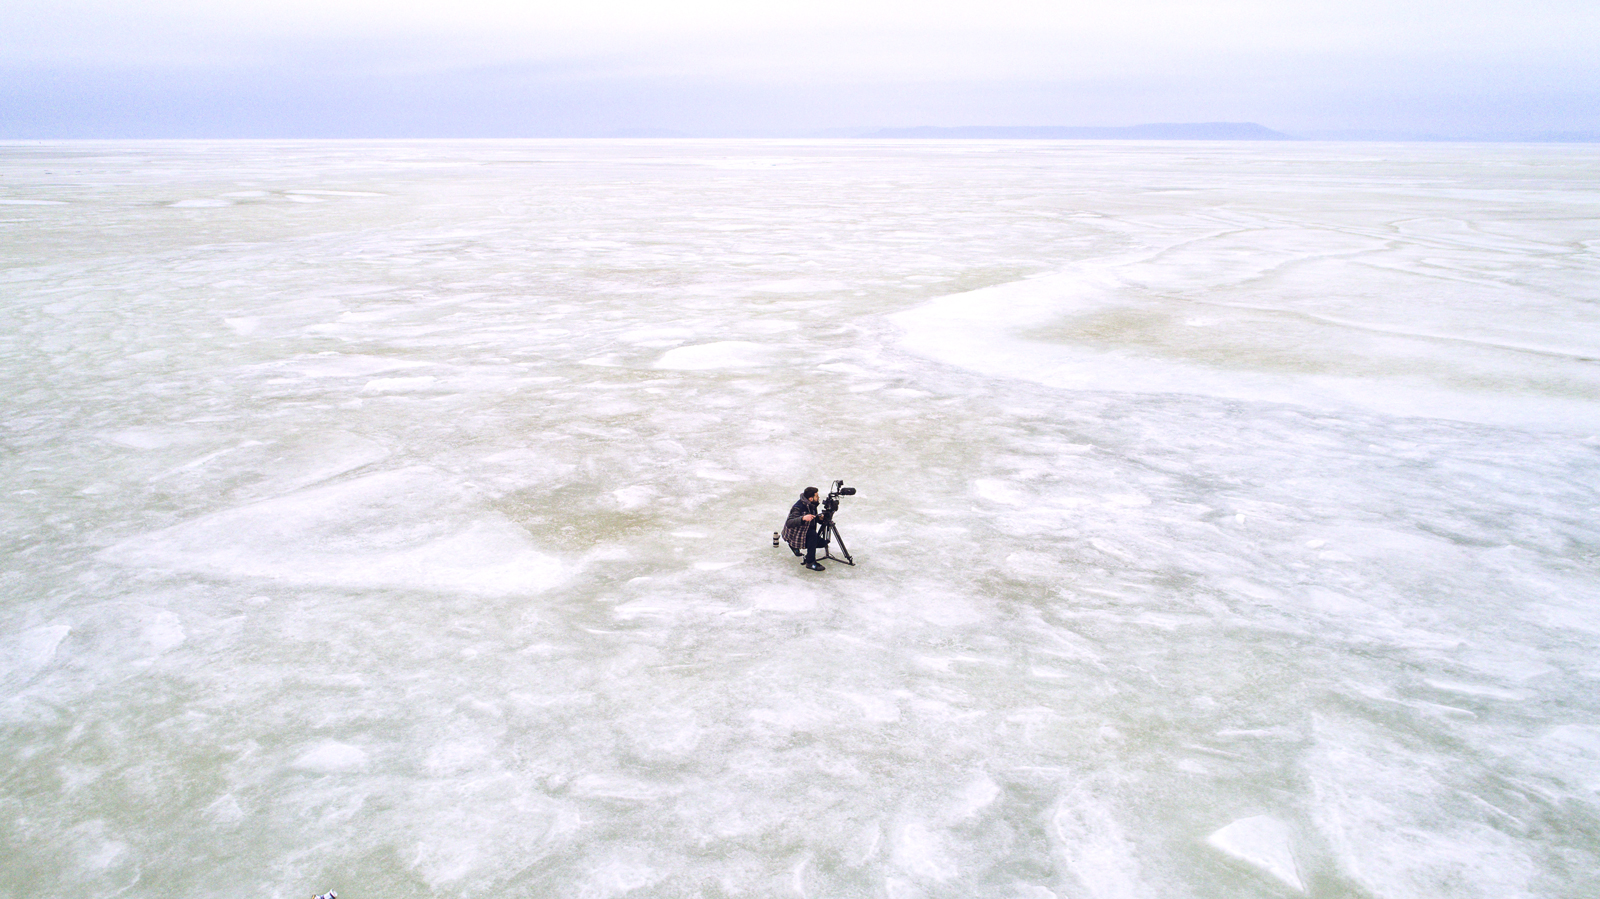 Kostis Nikolas (Cinematographer | Editor, Sound of Vladivostok)